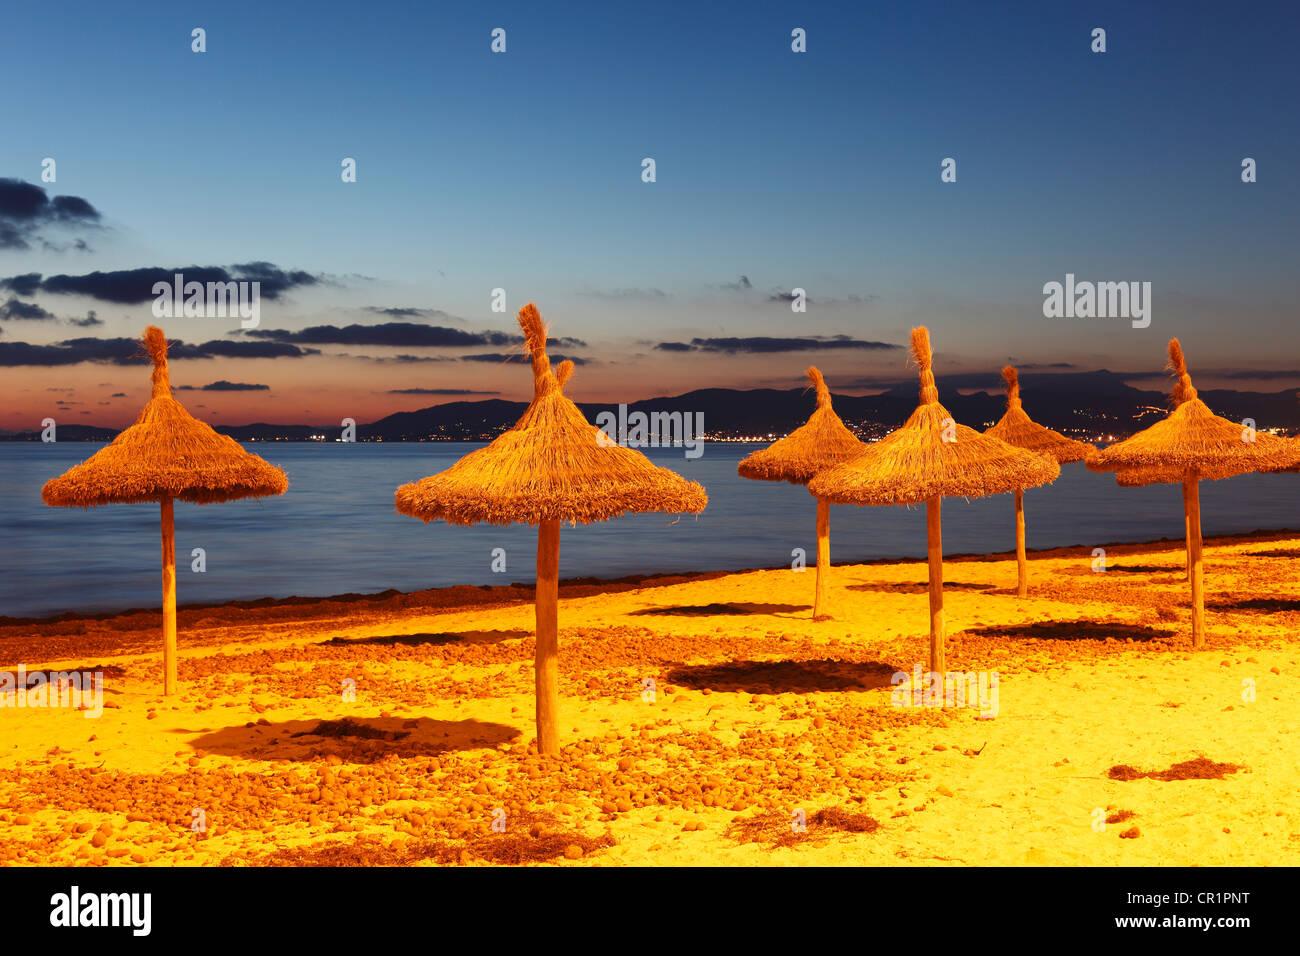 Stroh Sonnenschirme am Strand, S'Arenal, El Arenal, Abend-Stimmung, Mallorca, Balearen, Spanien, Europa Stockbild